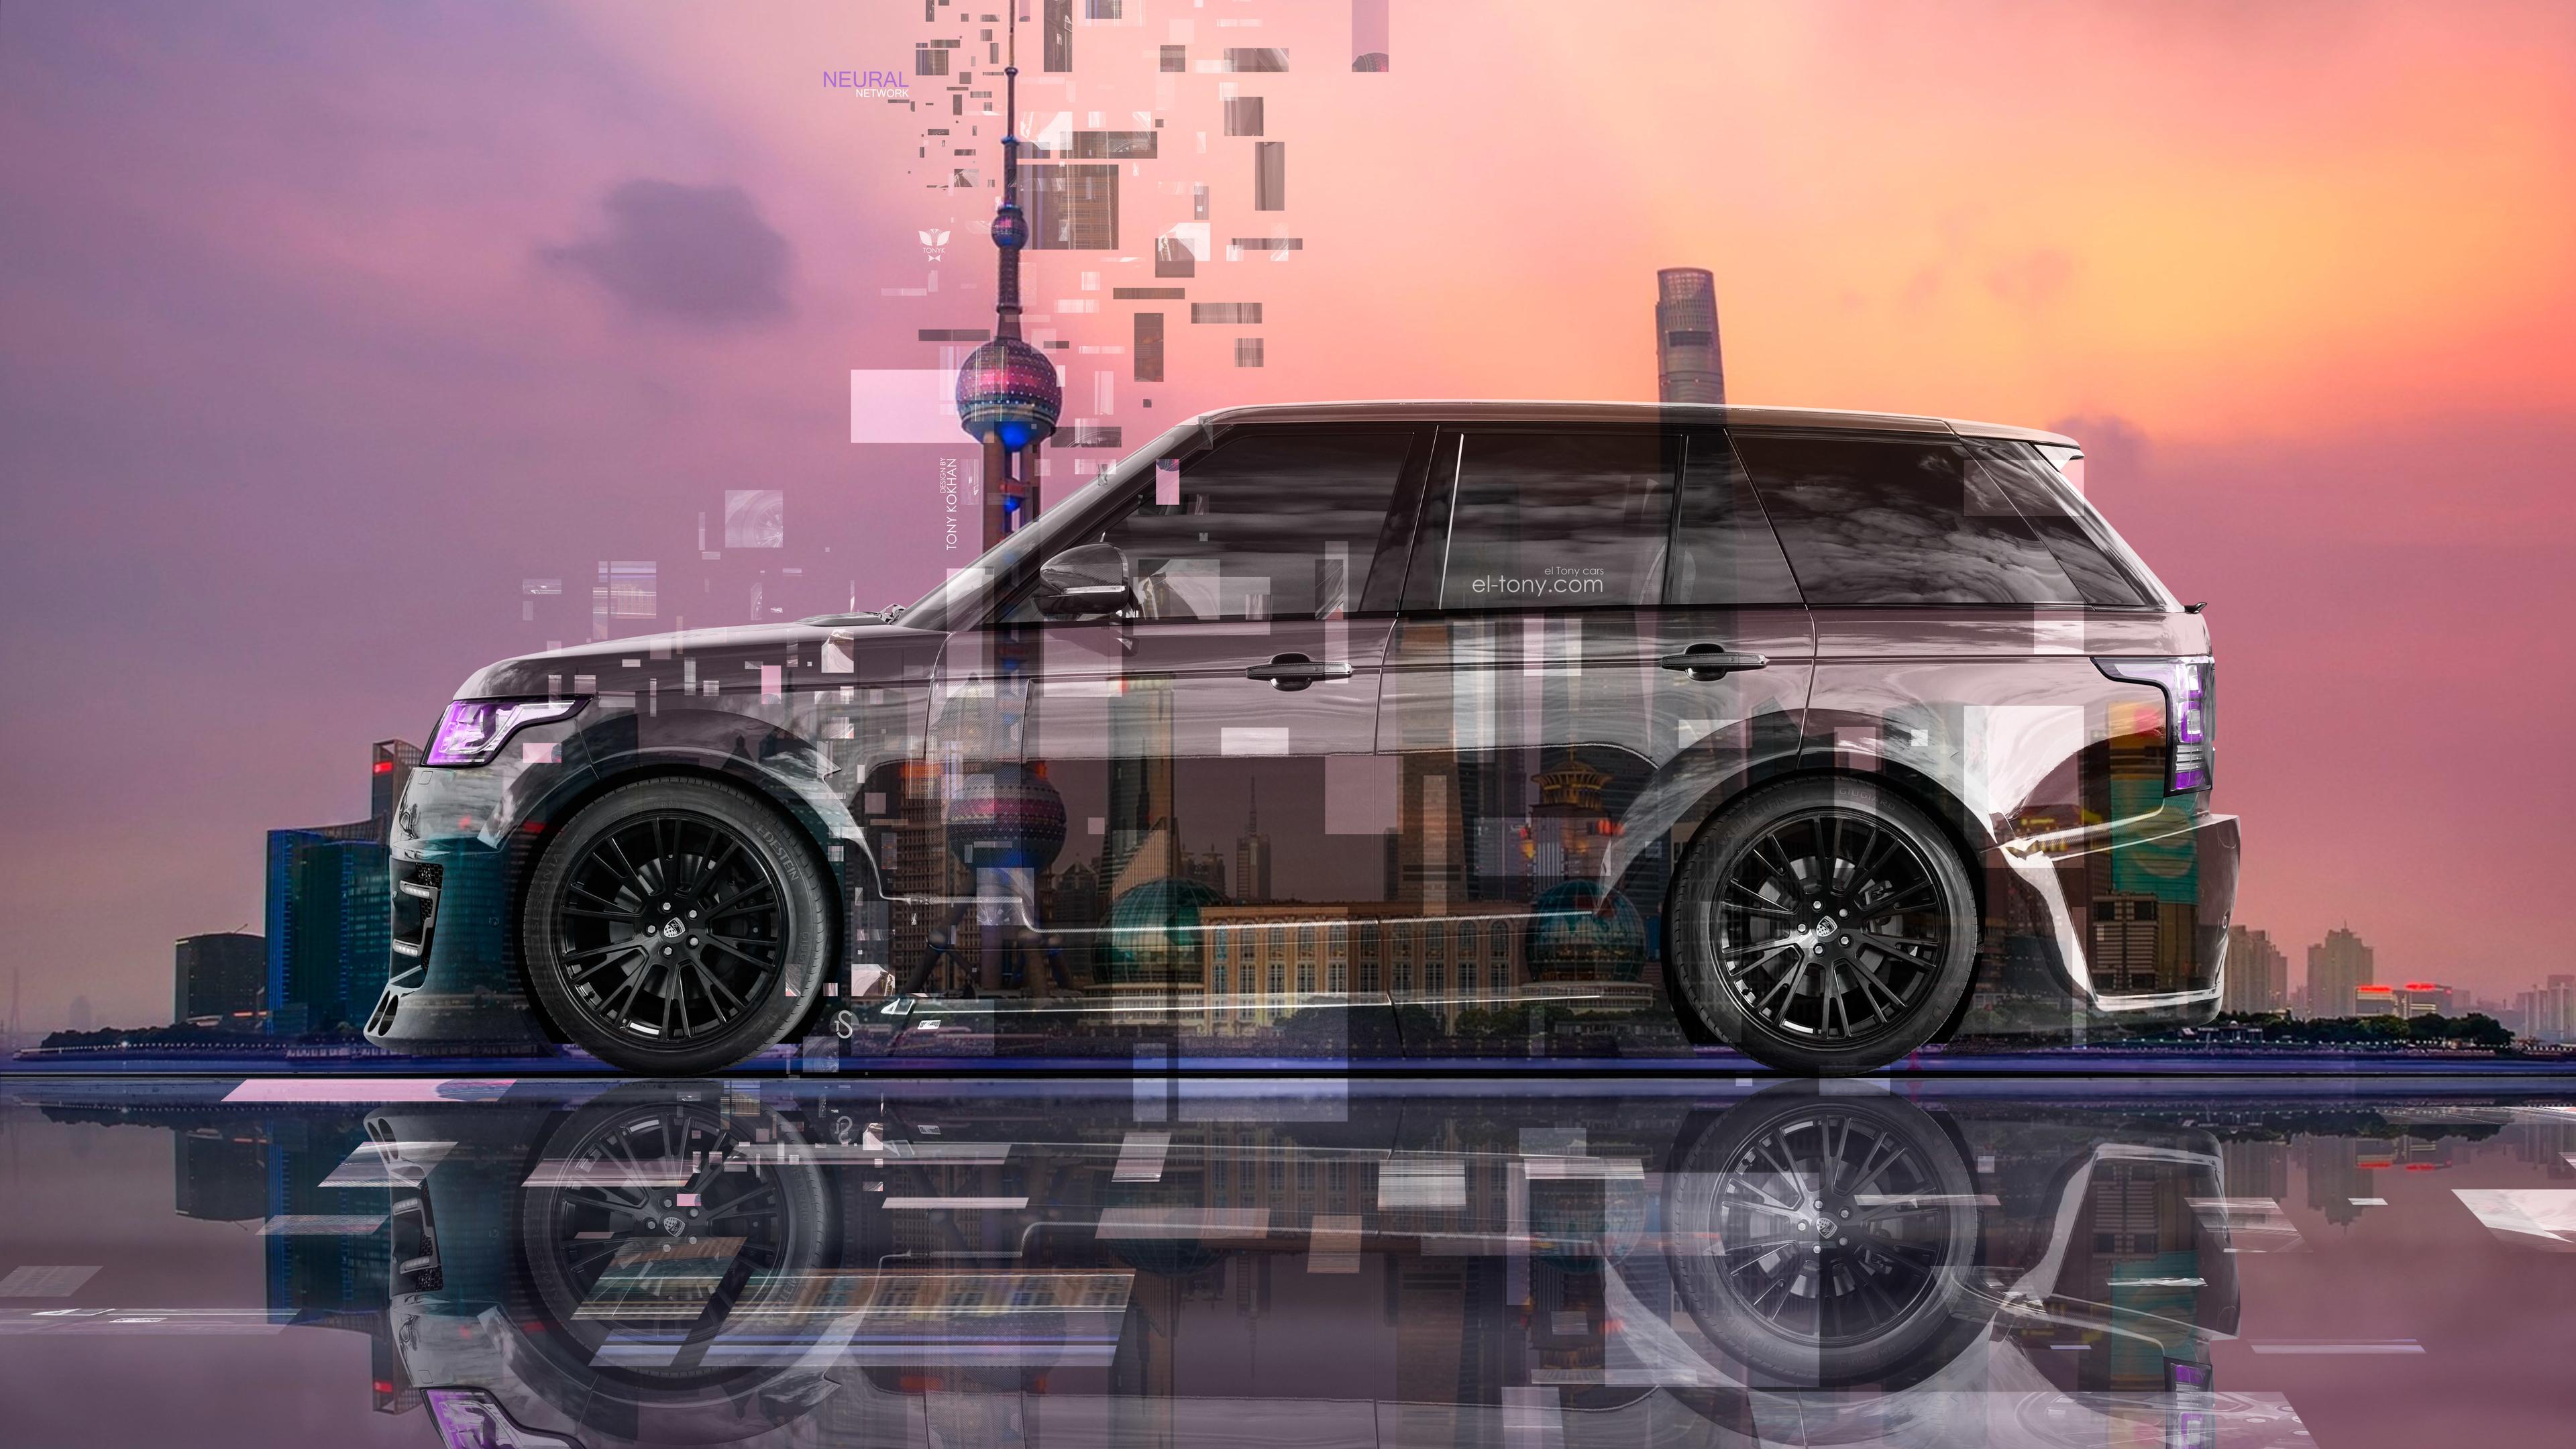 land rover tuning lumma side super crystal shanghai china 4k 1546362066 - Land Rover Tuning Lumma Side Super Crystal Shanghai China 4k - range rover wallpapers, land rover wallpapers, hd-wallpapers, 8k wallpapers, 5k wallpapers, 4k-wallpapers